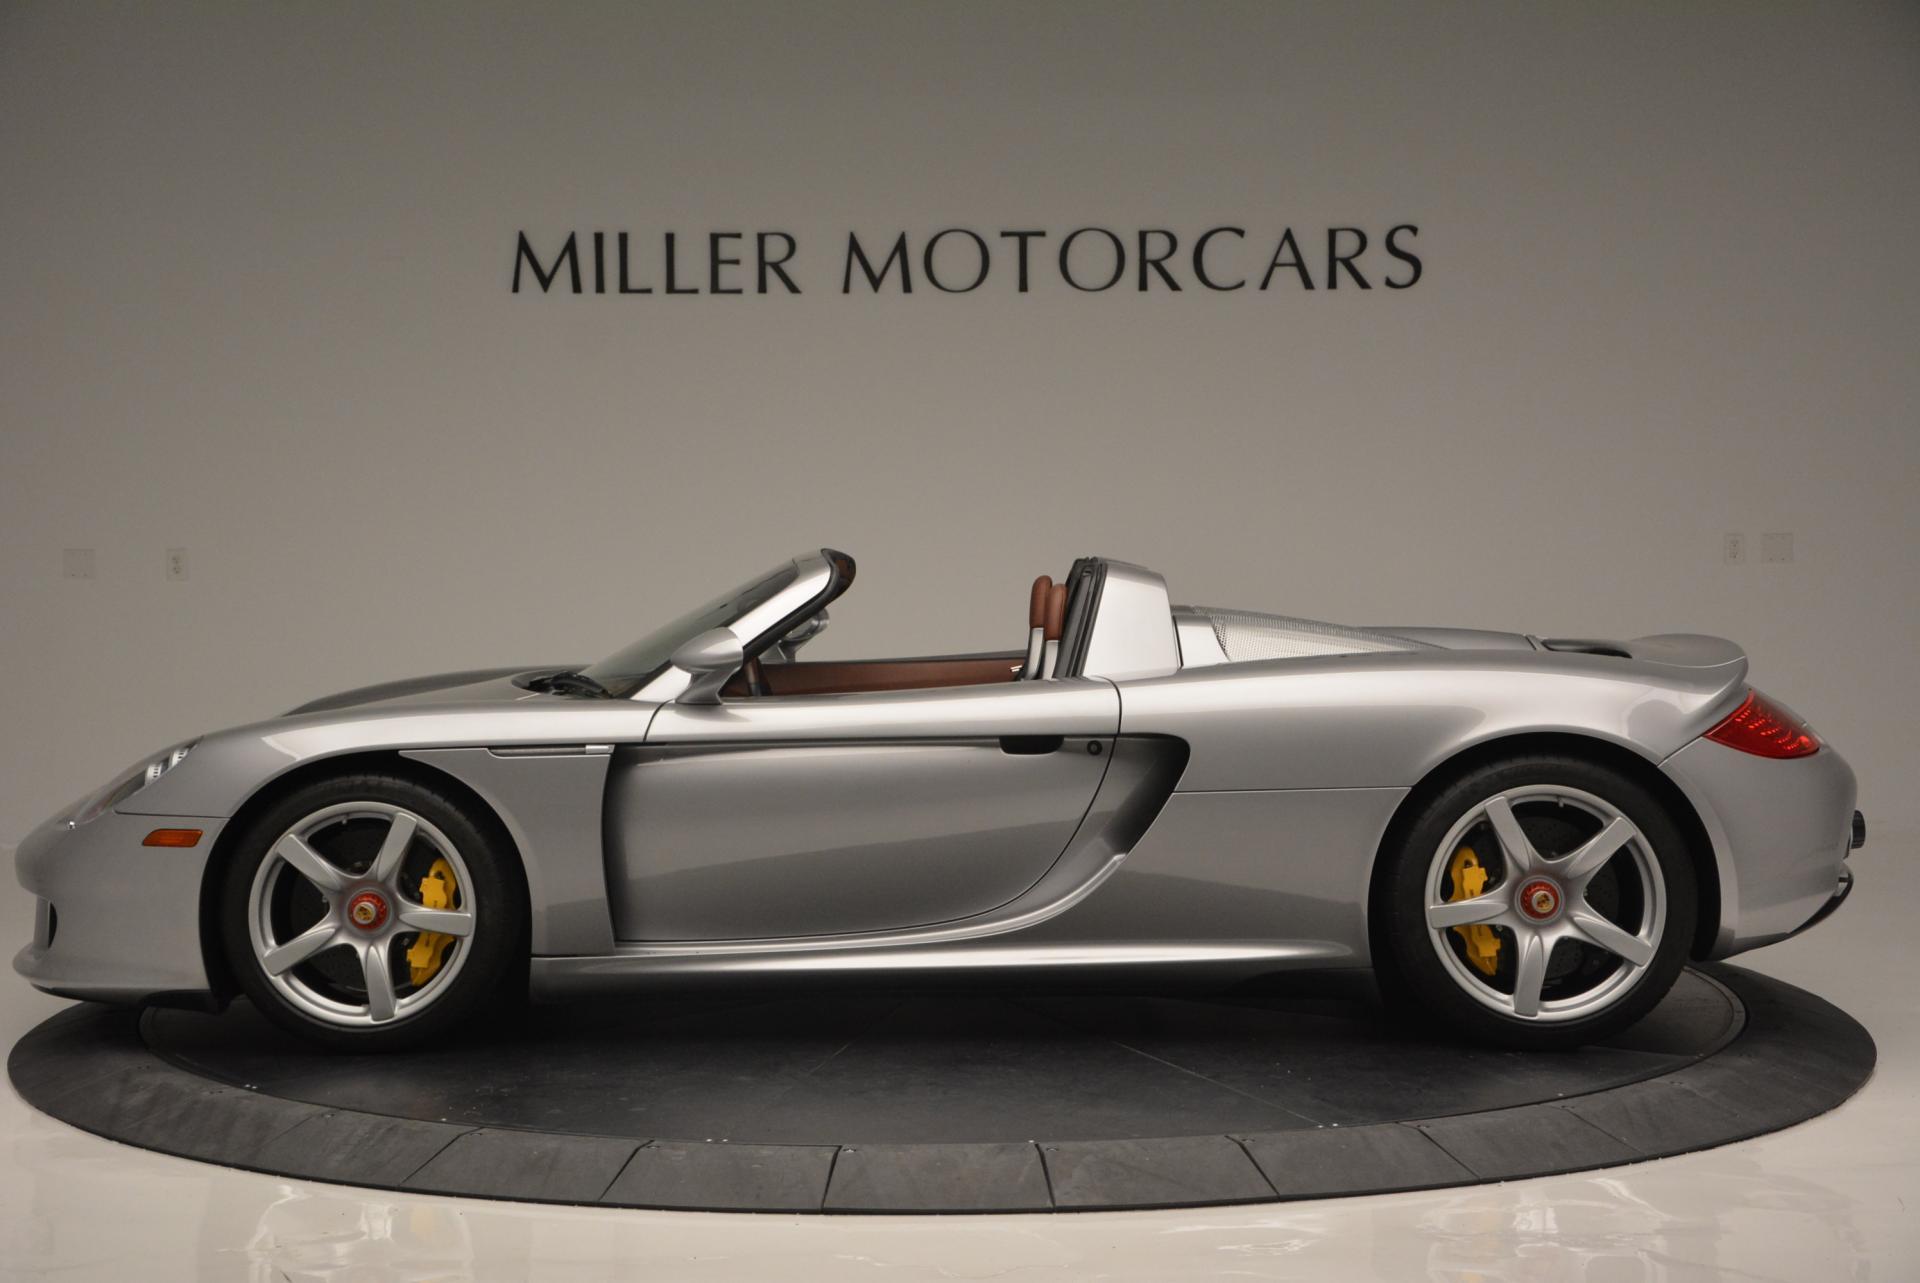 Used 2005 Porsche Carrera GT  For Sale In Greenwich, CT 108_p4